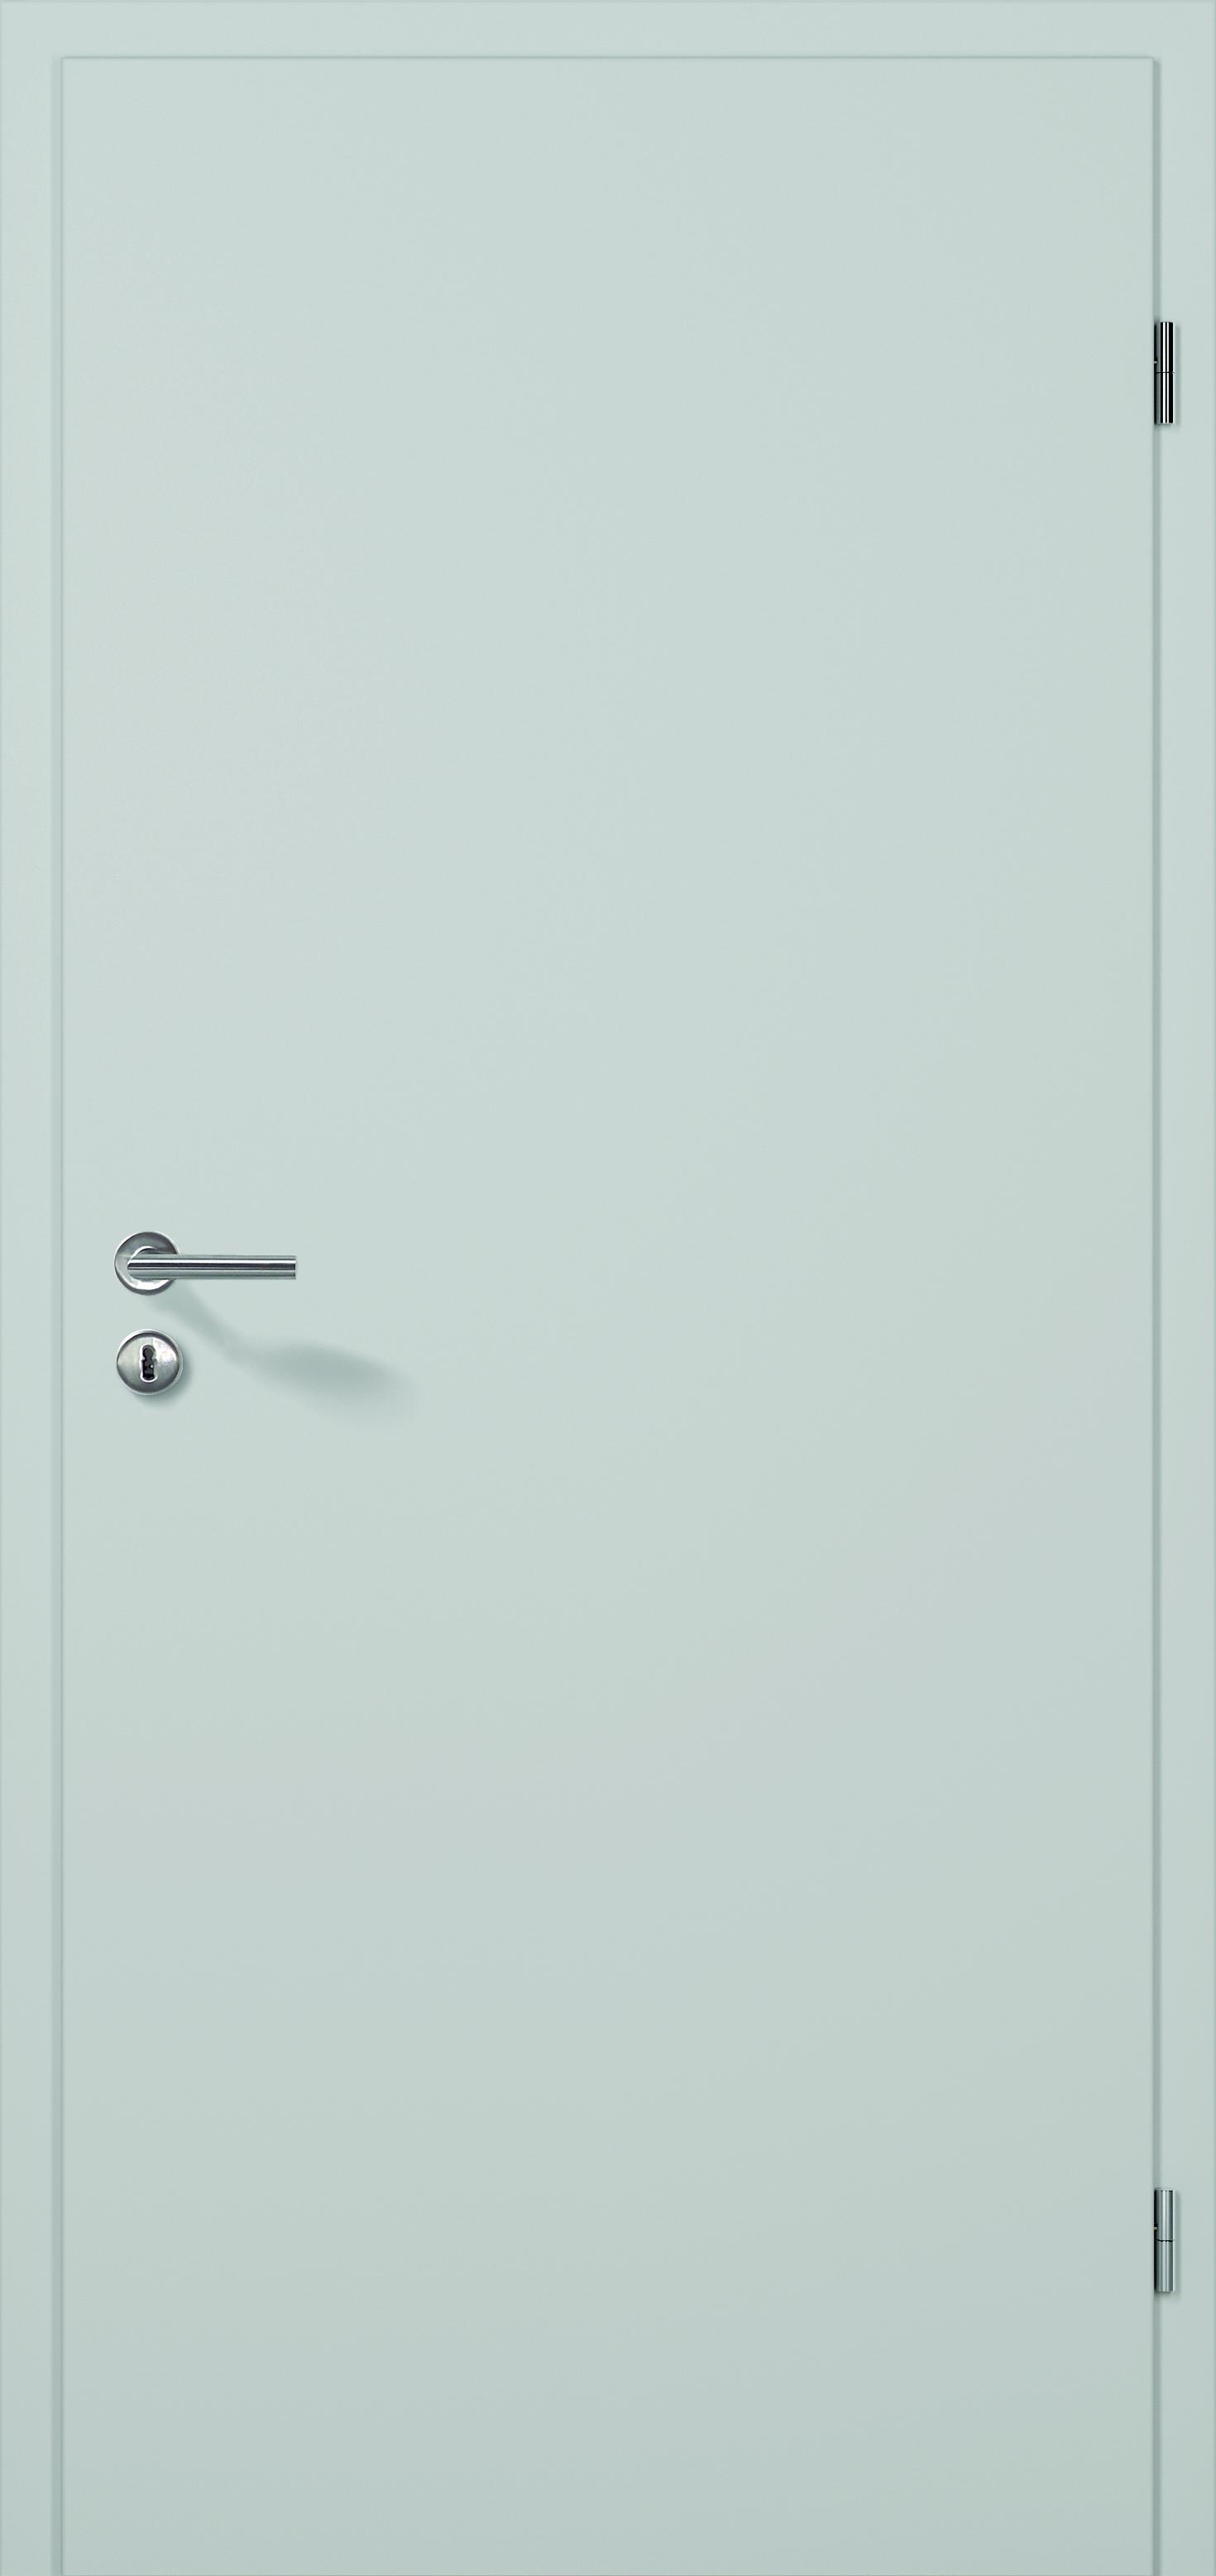 Ultramat - světle šedý